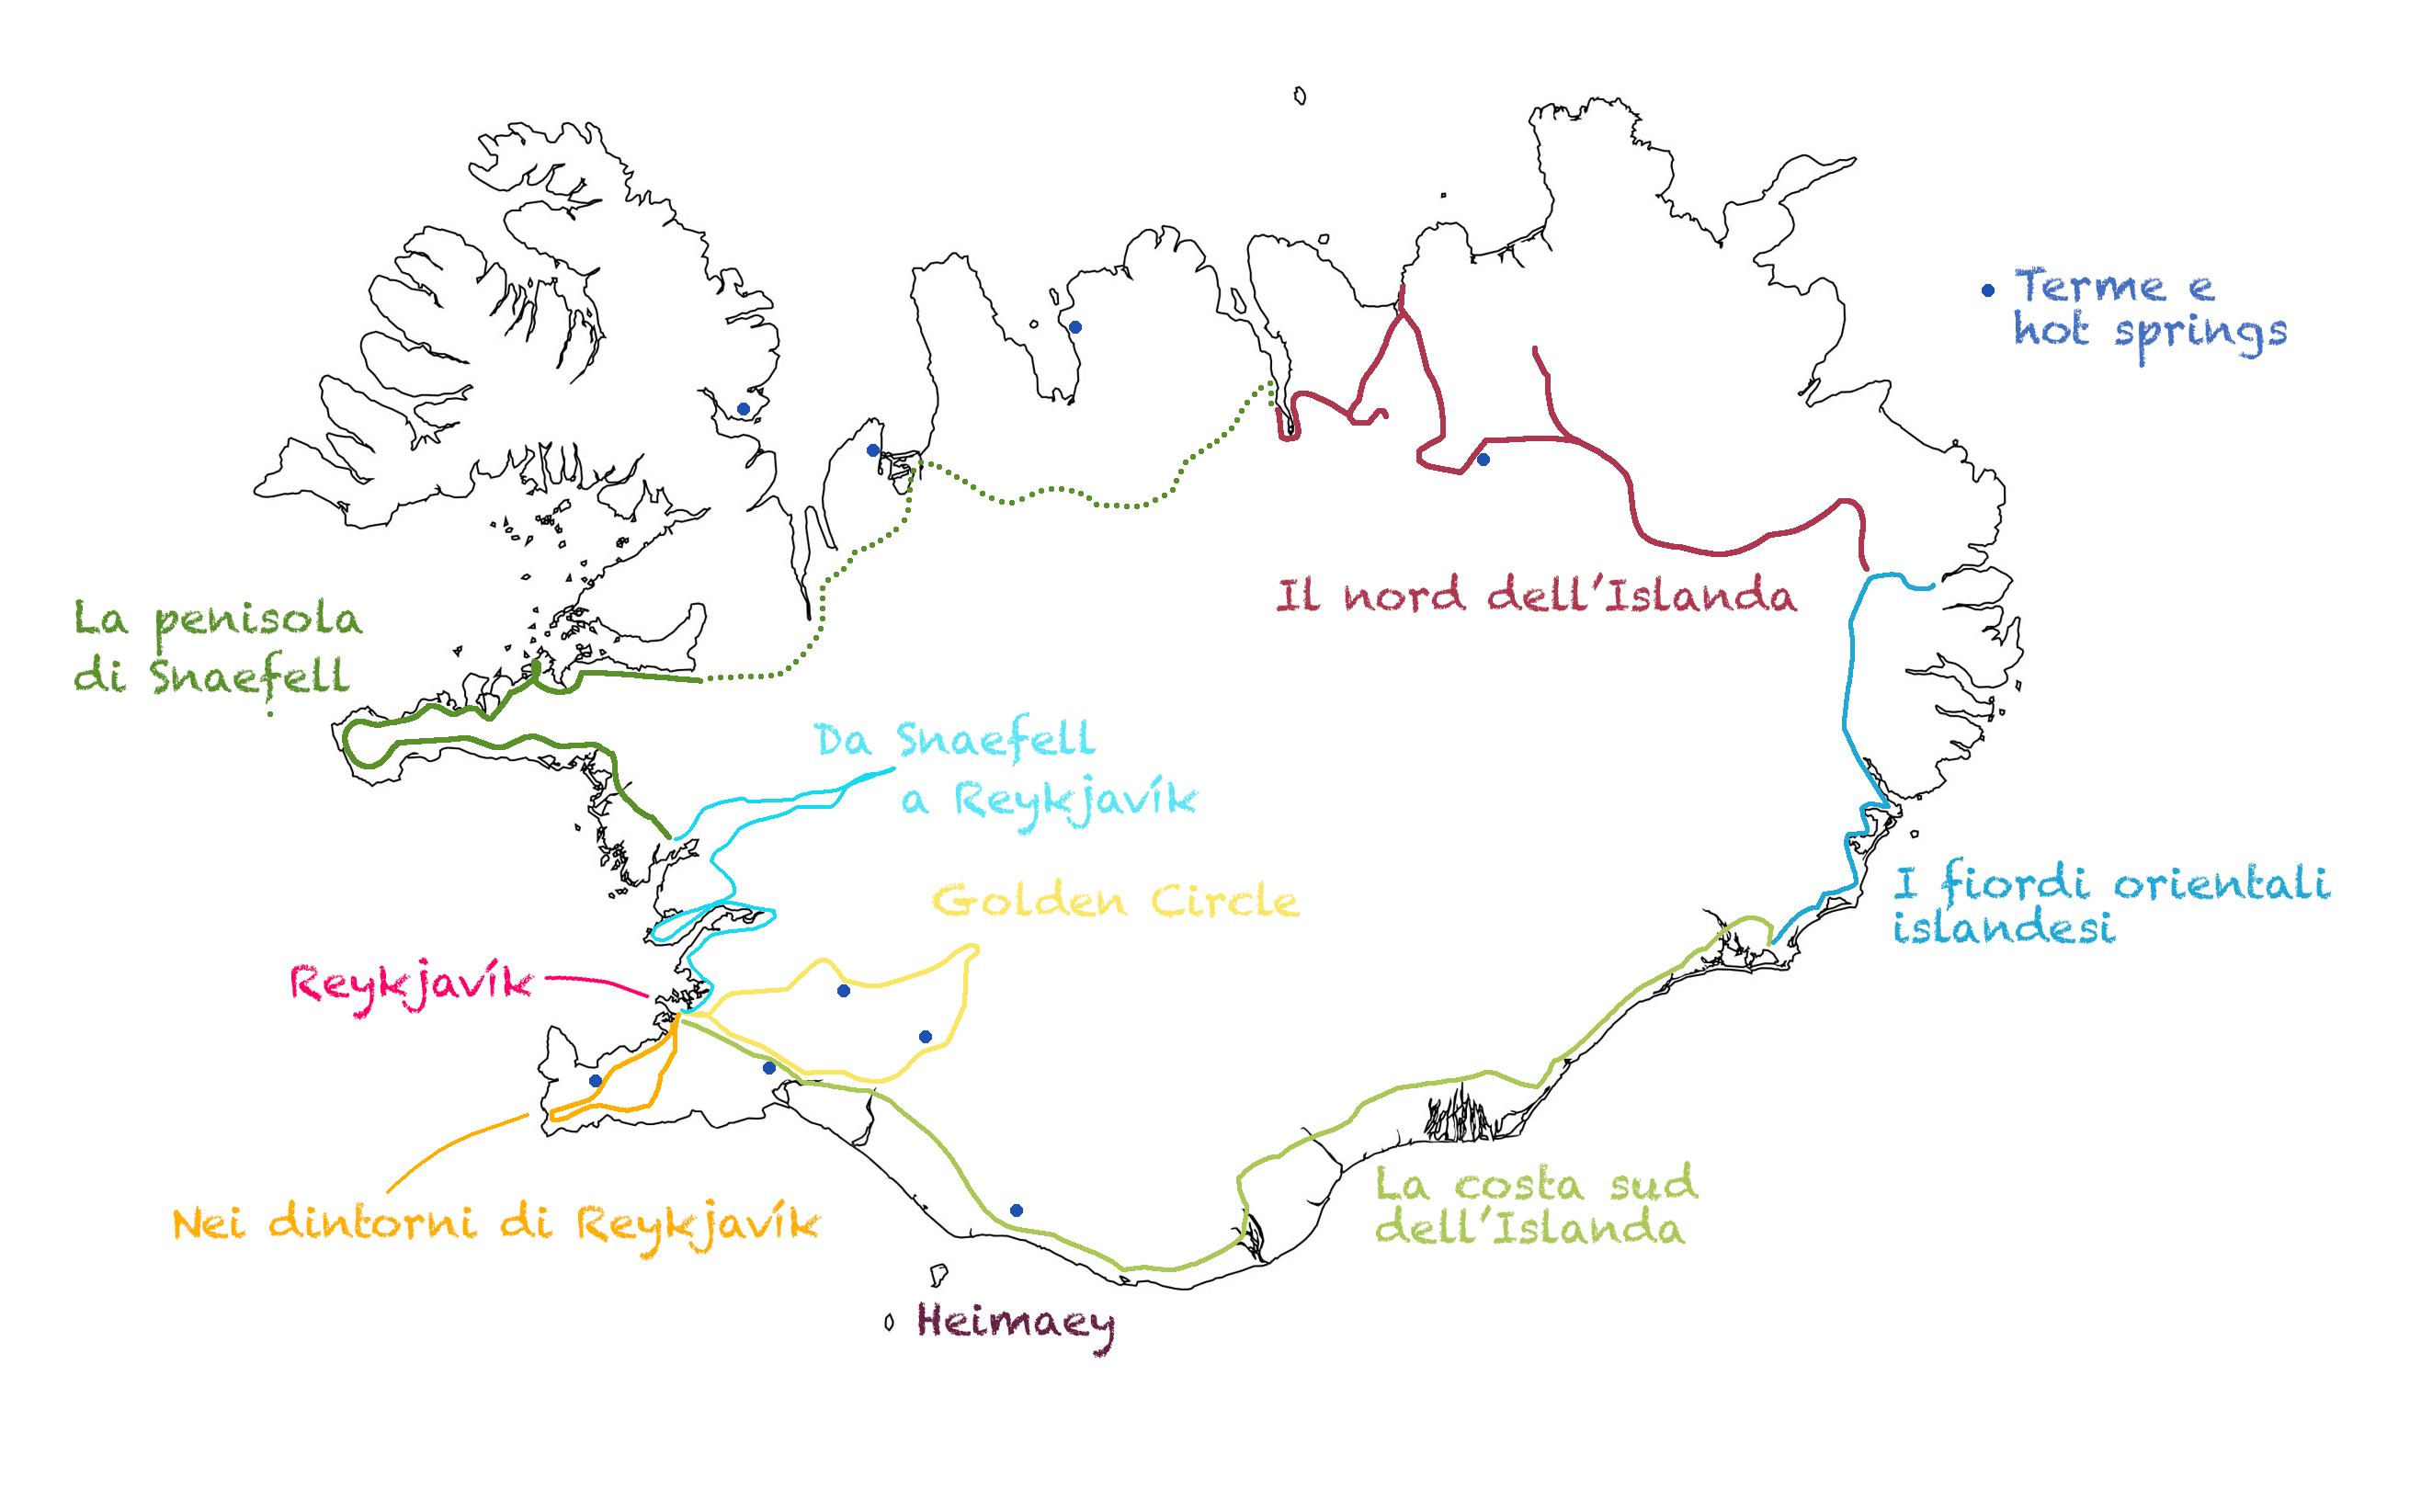 siti Web di incontri in Islanda